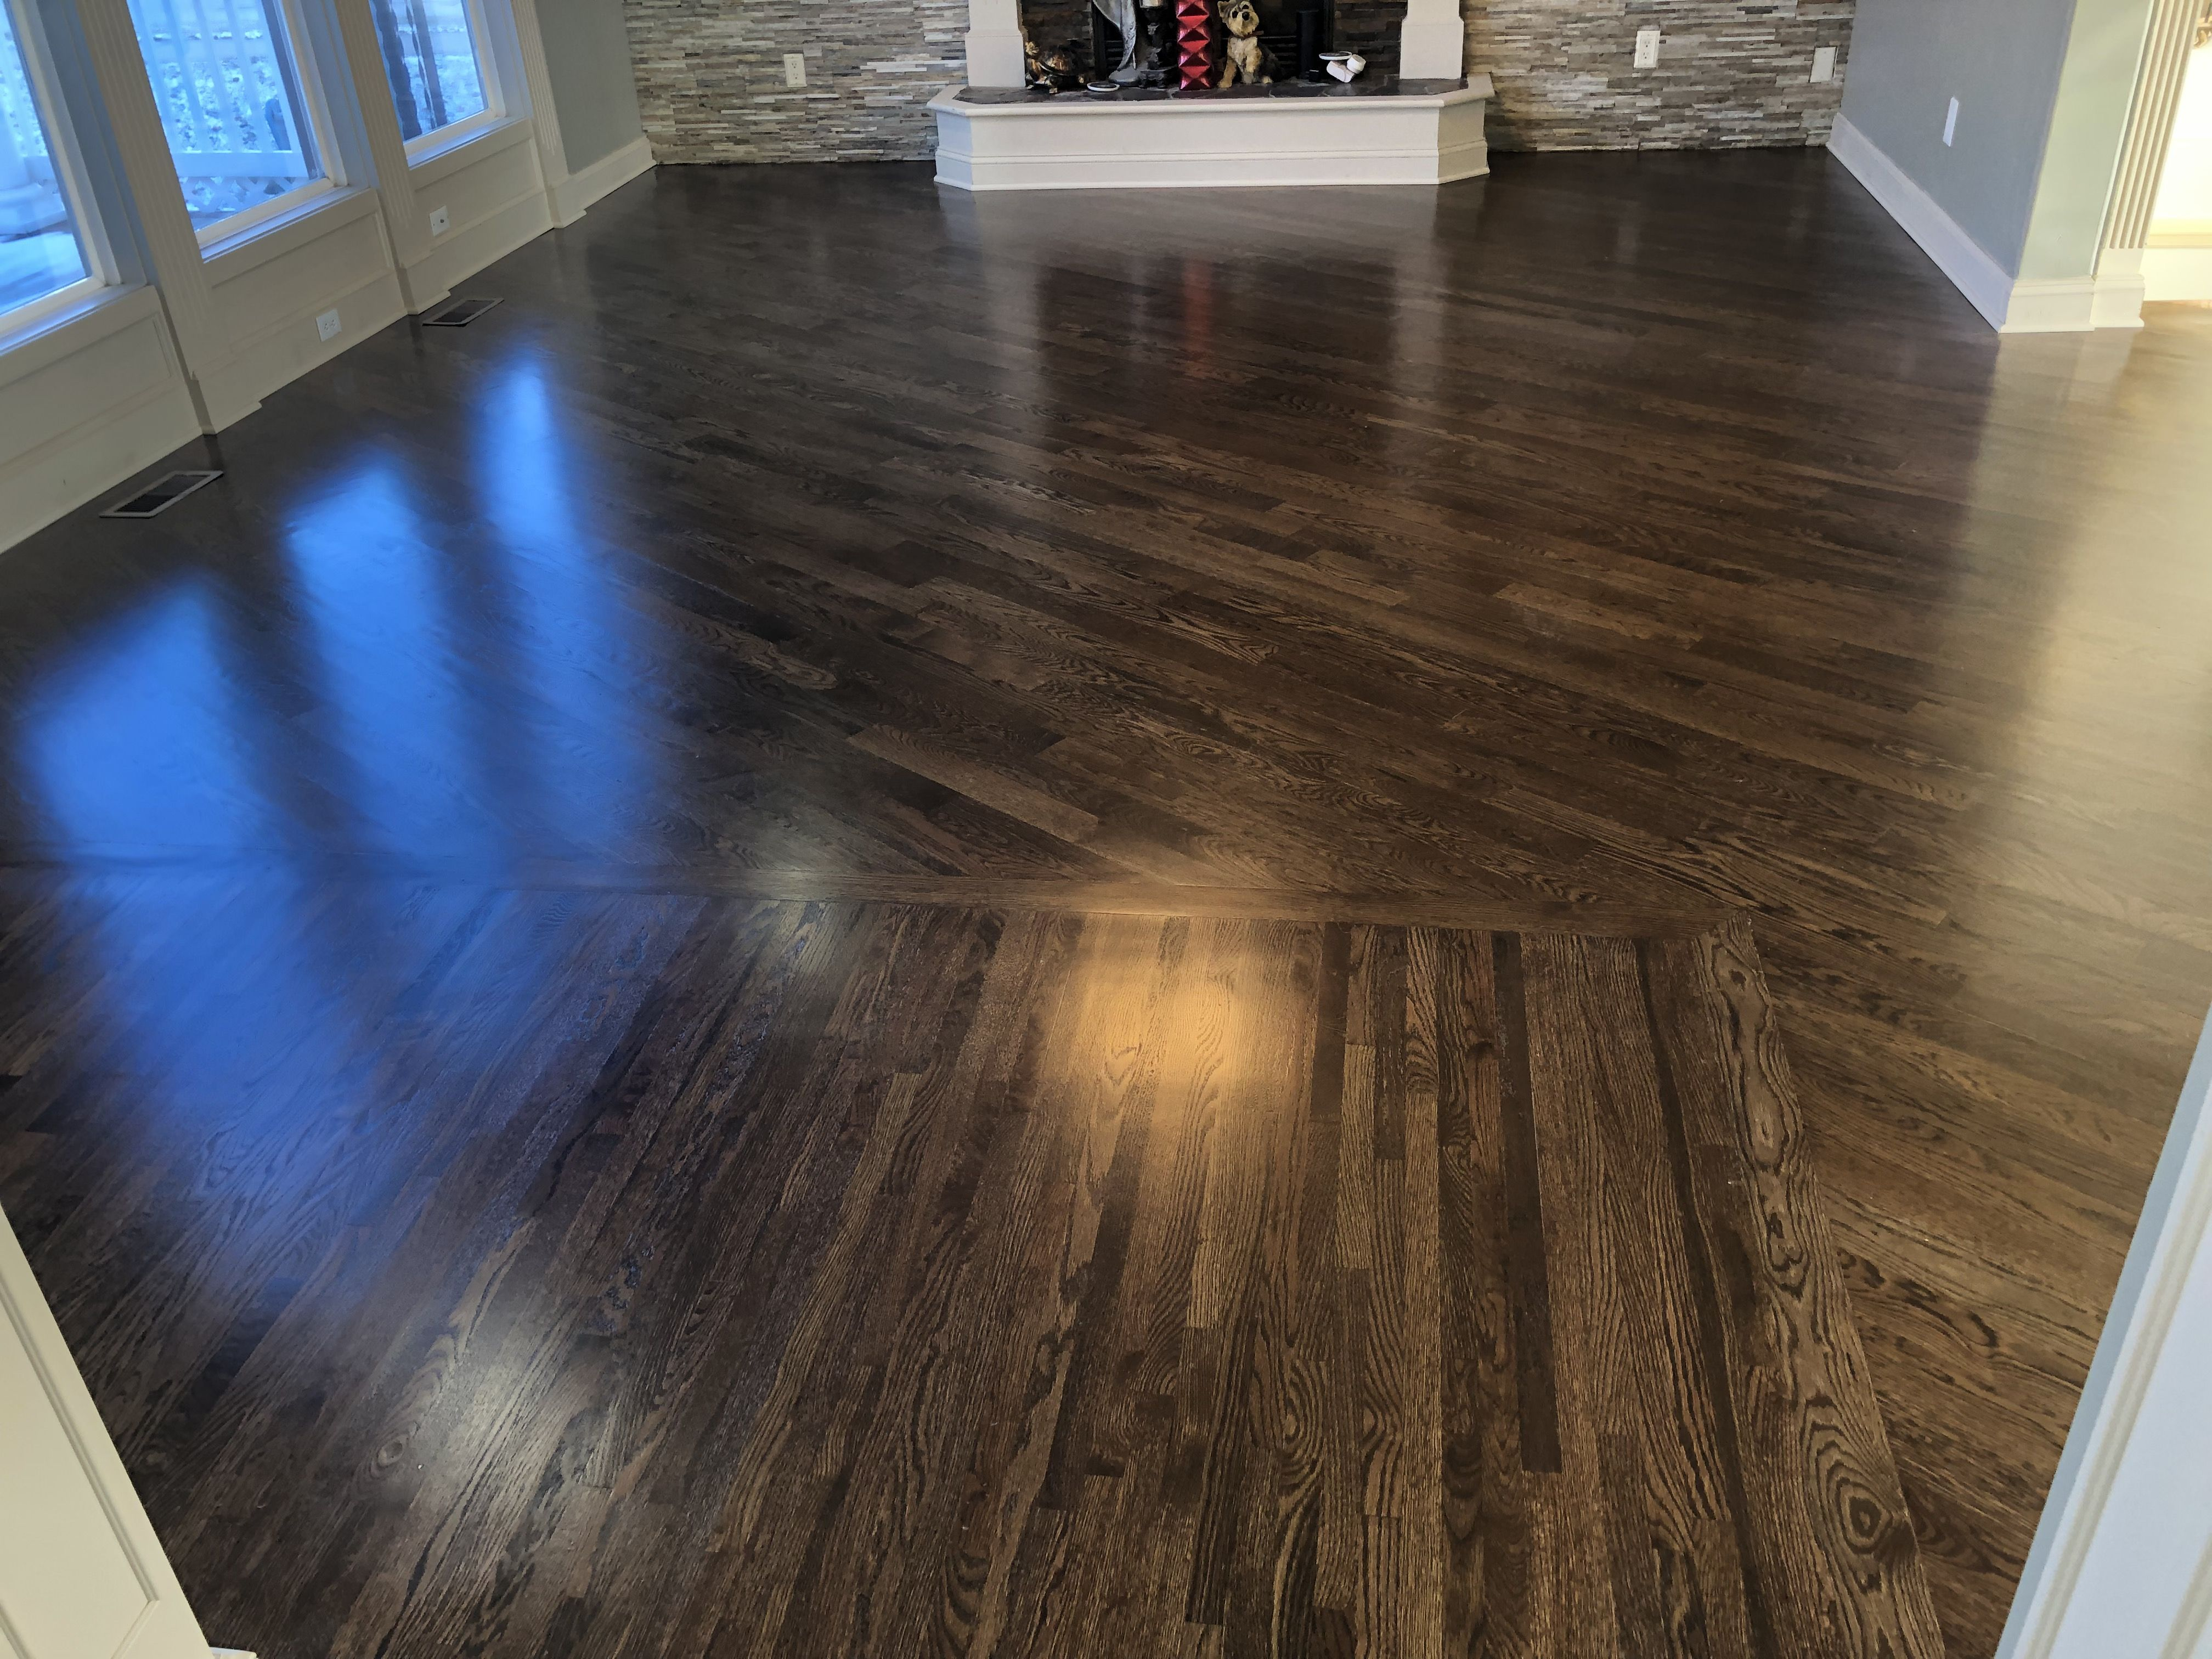 Hardwood Floor Installation And Refinish Platte City Mo Hardwood Floor Refinishing Installing Hardwood Floors Hardwood Floors Wood Floors Wide Plank